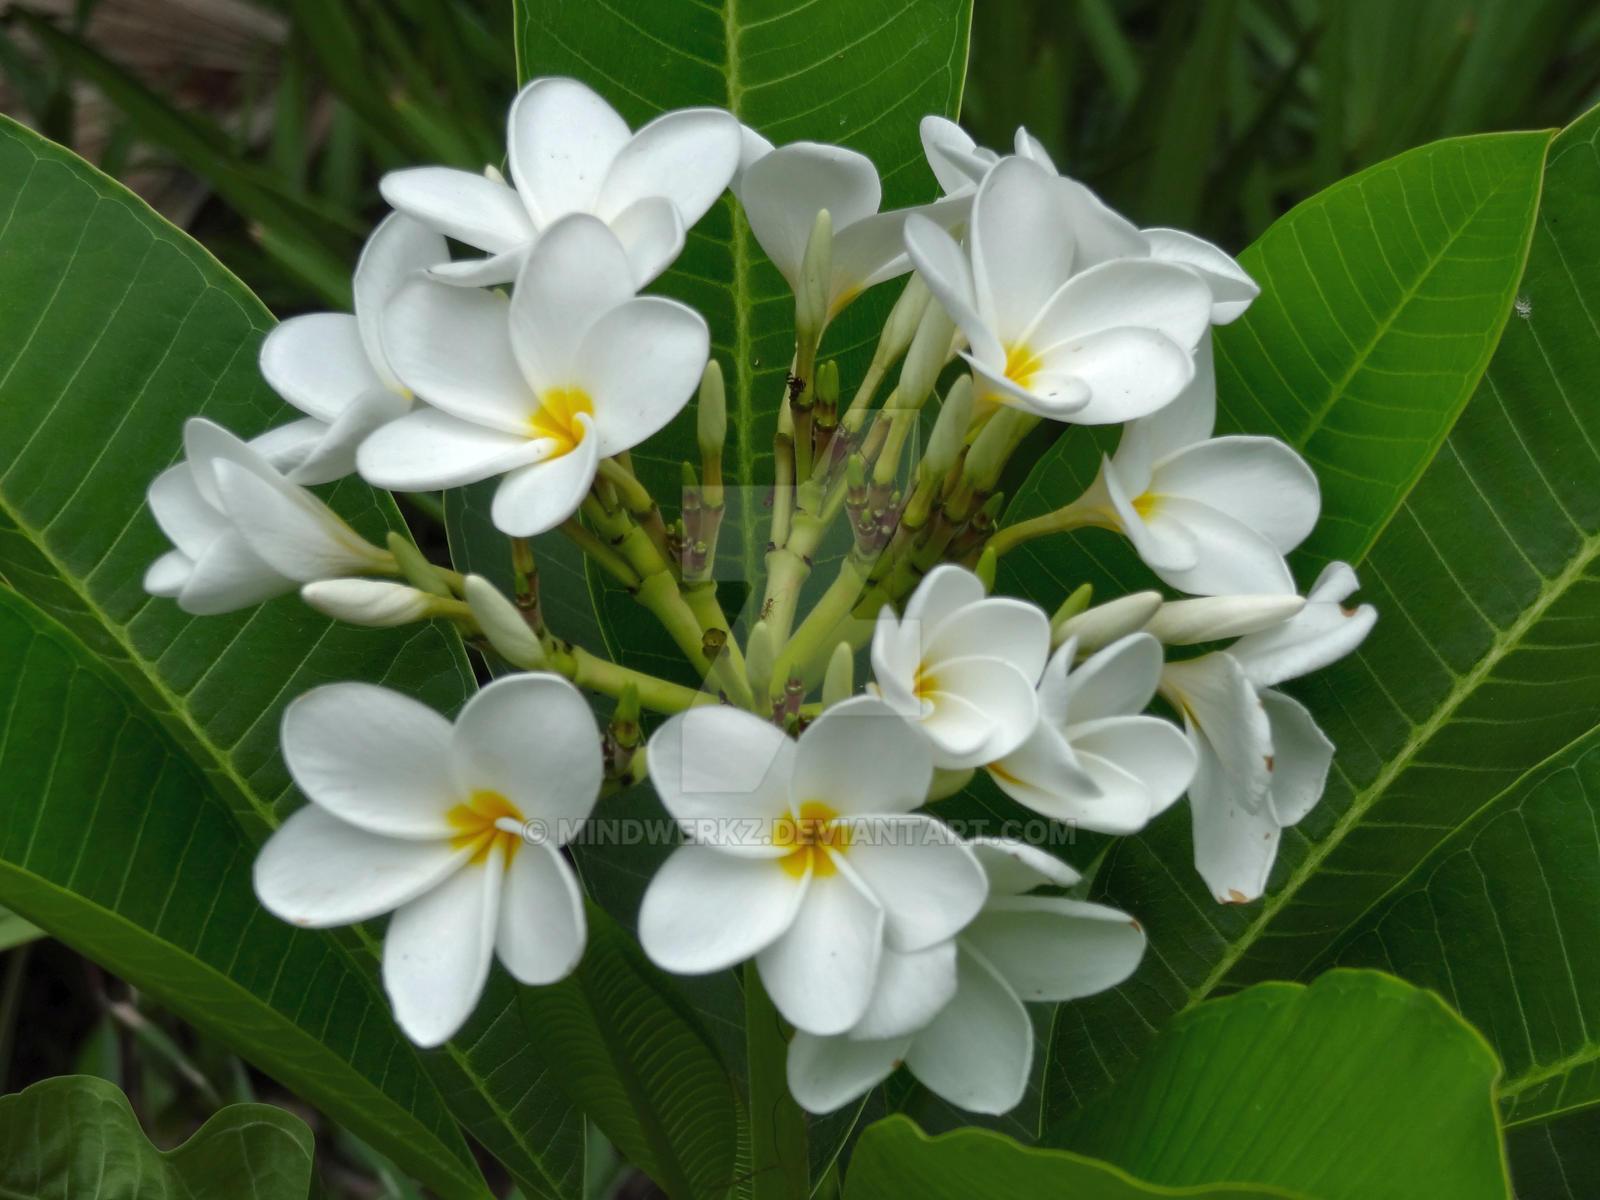 Plumeria Flowers by Mindwerkz